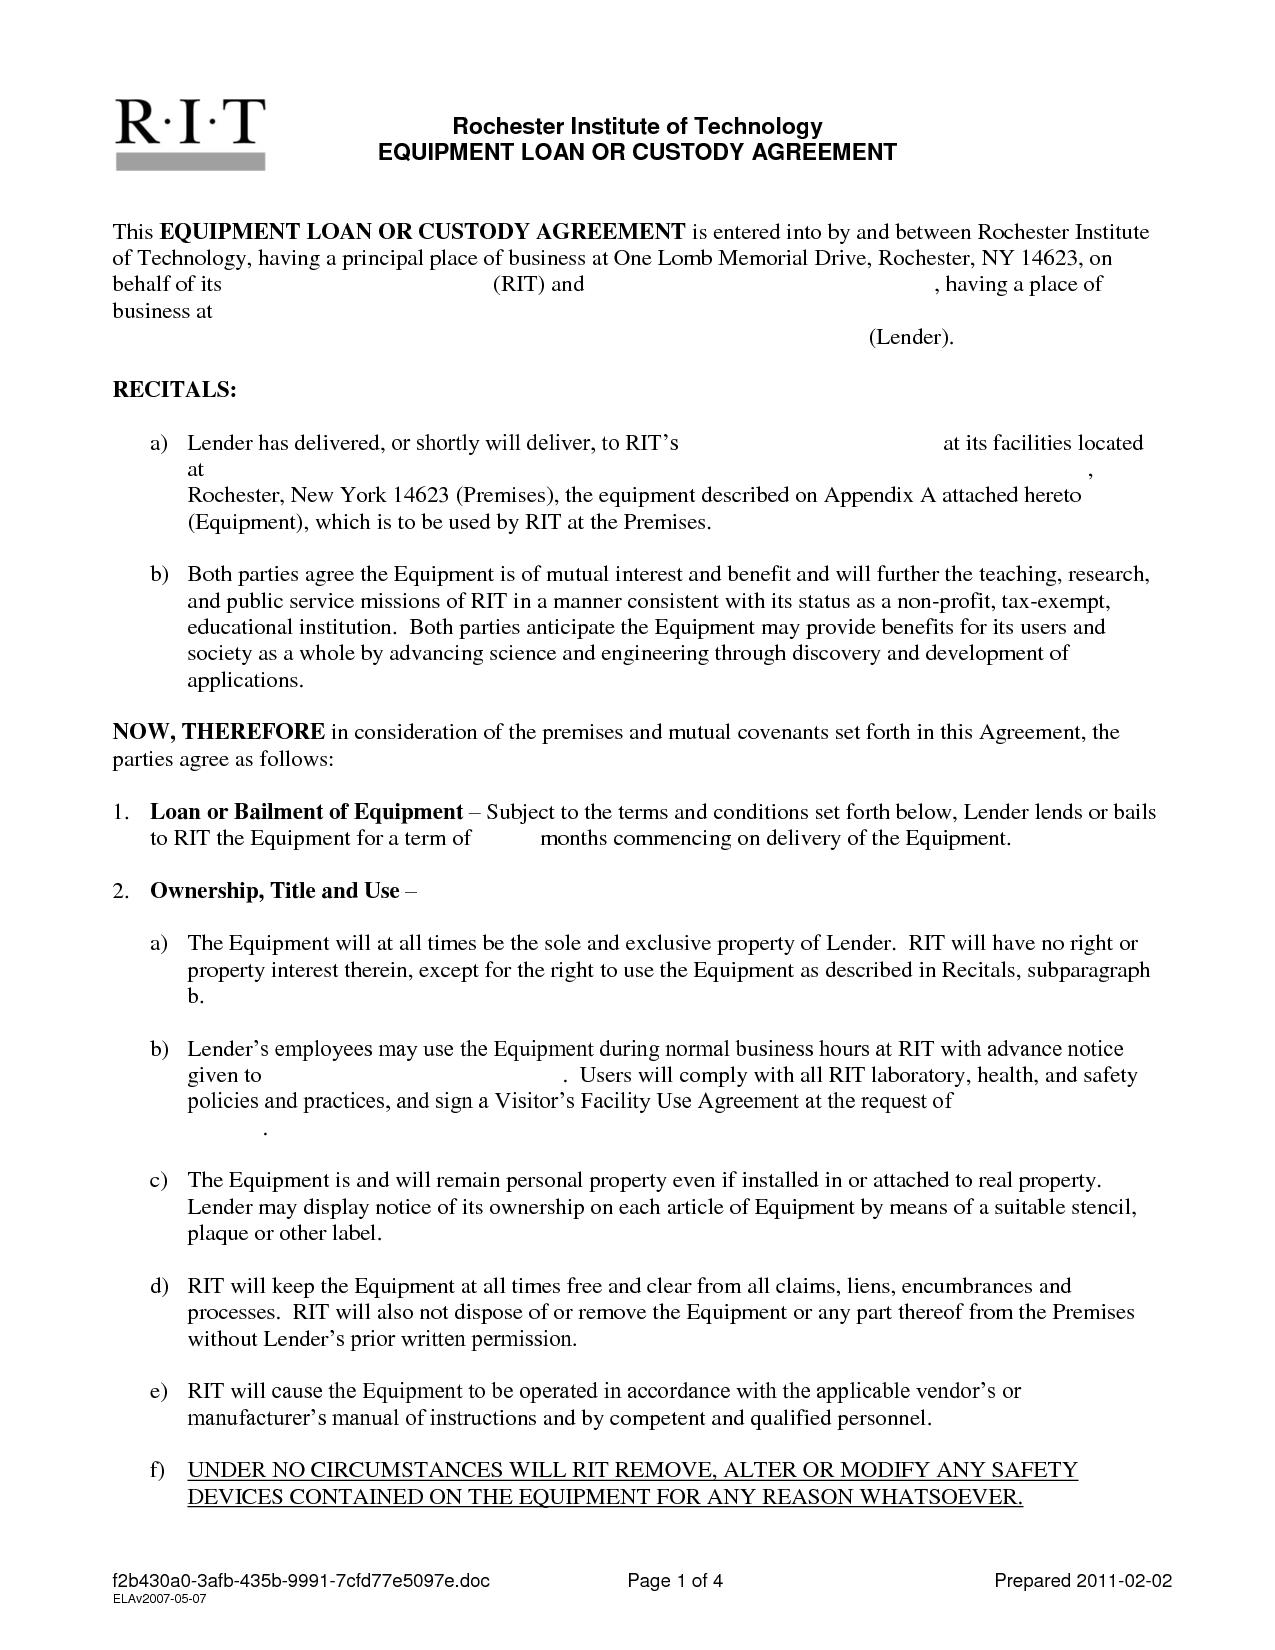 Car Loan Agreement Template Pdf FREE DOWNLOAD - Car loan agreement template pdf